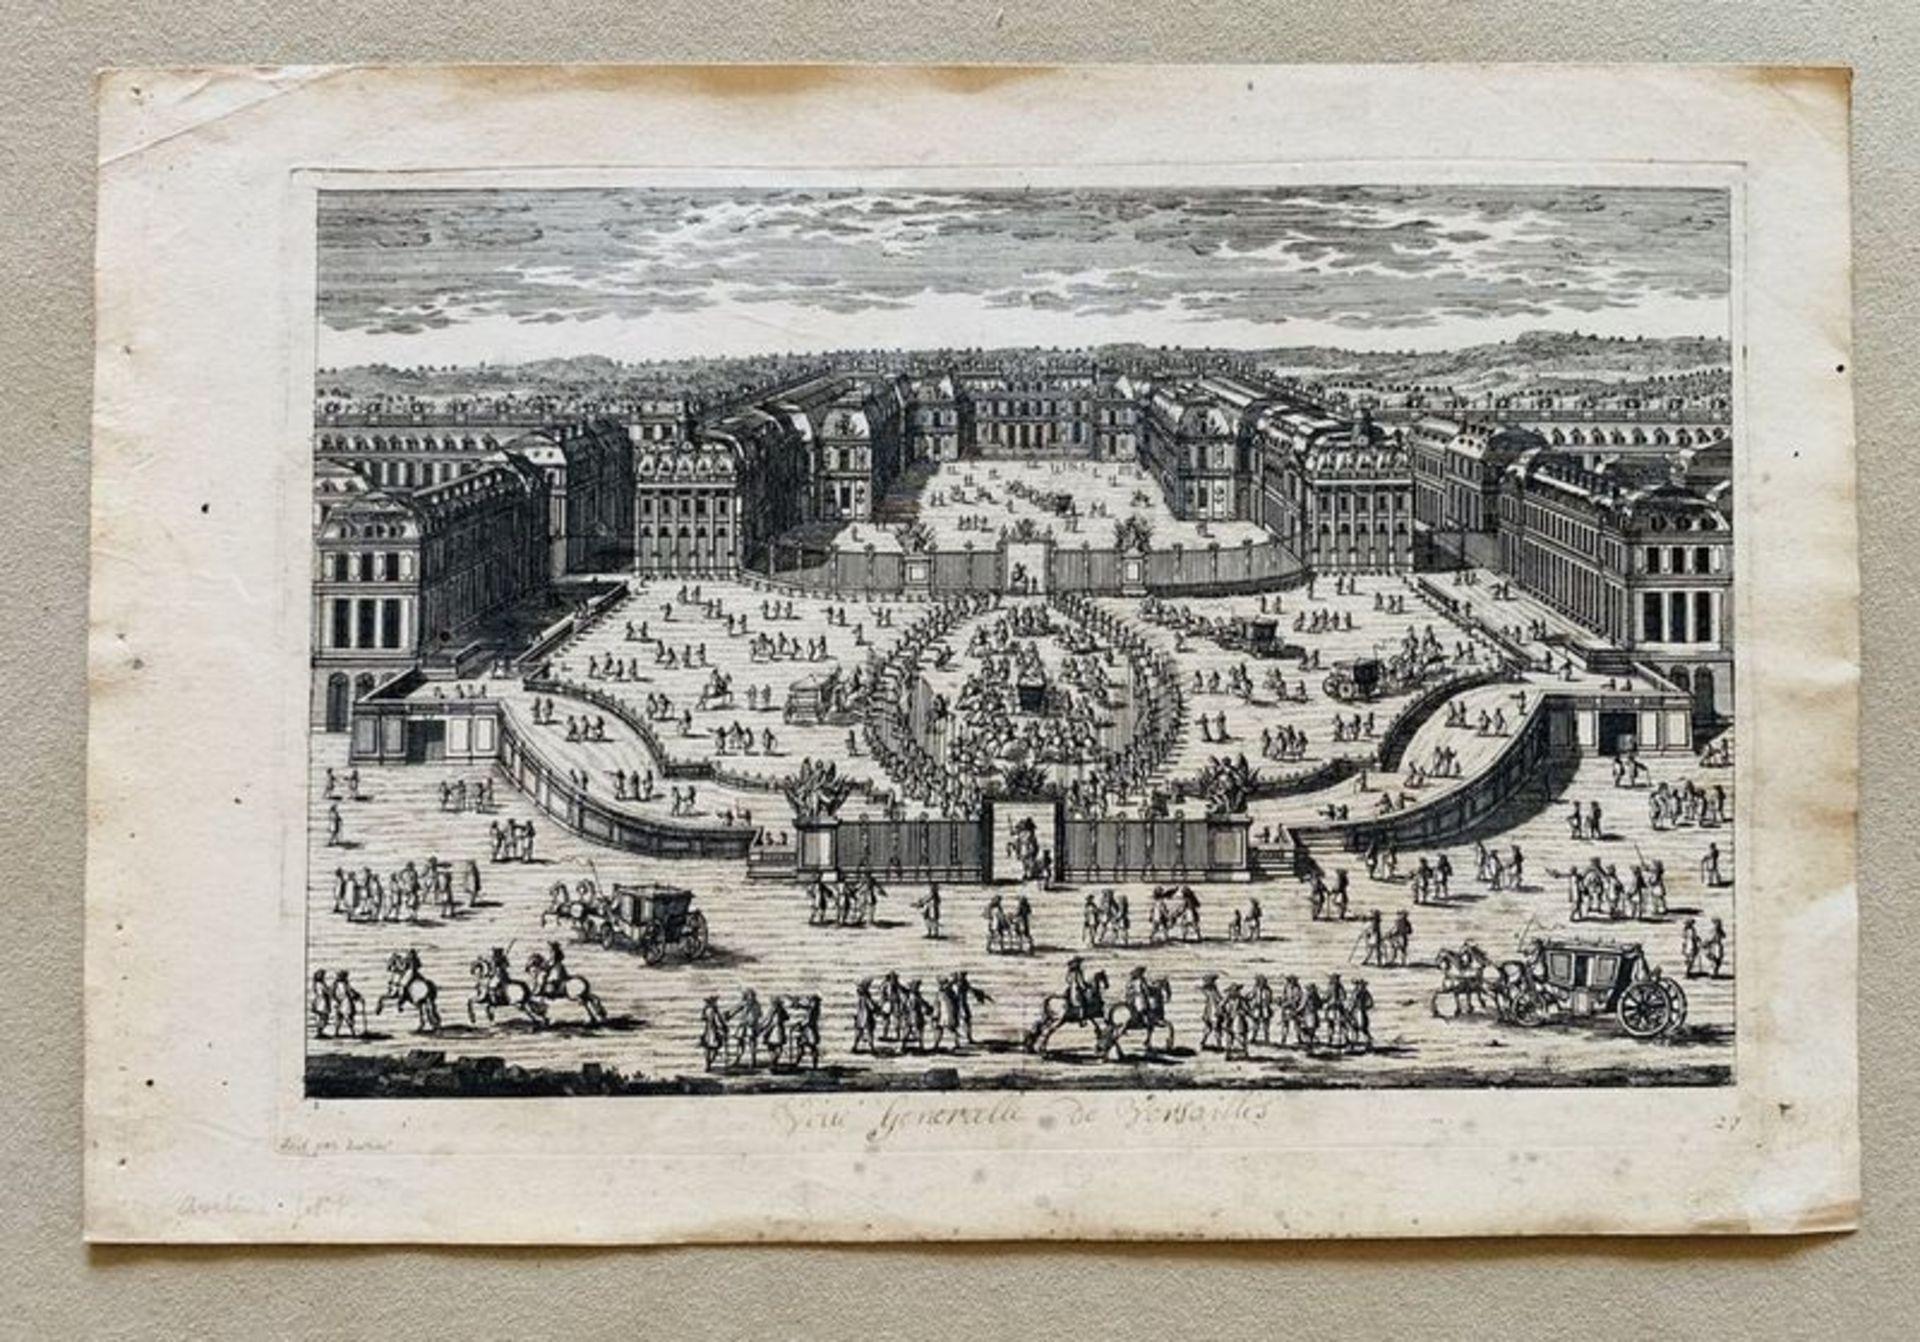 Los 570 - Pierre Aveline (1656-1722) View of Versailles - Etching End of XVII century - [...]